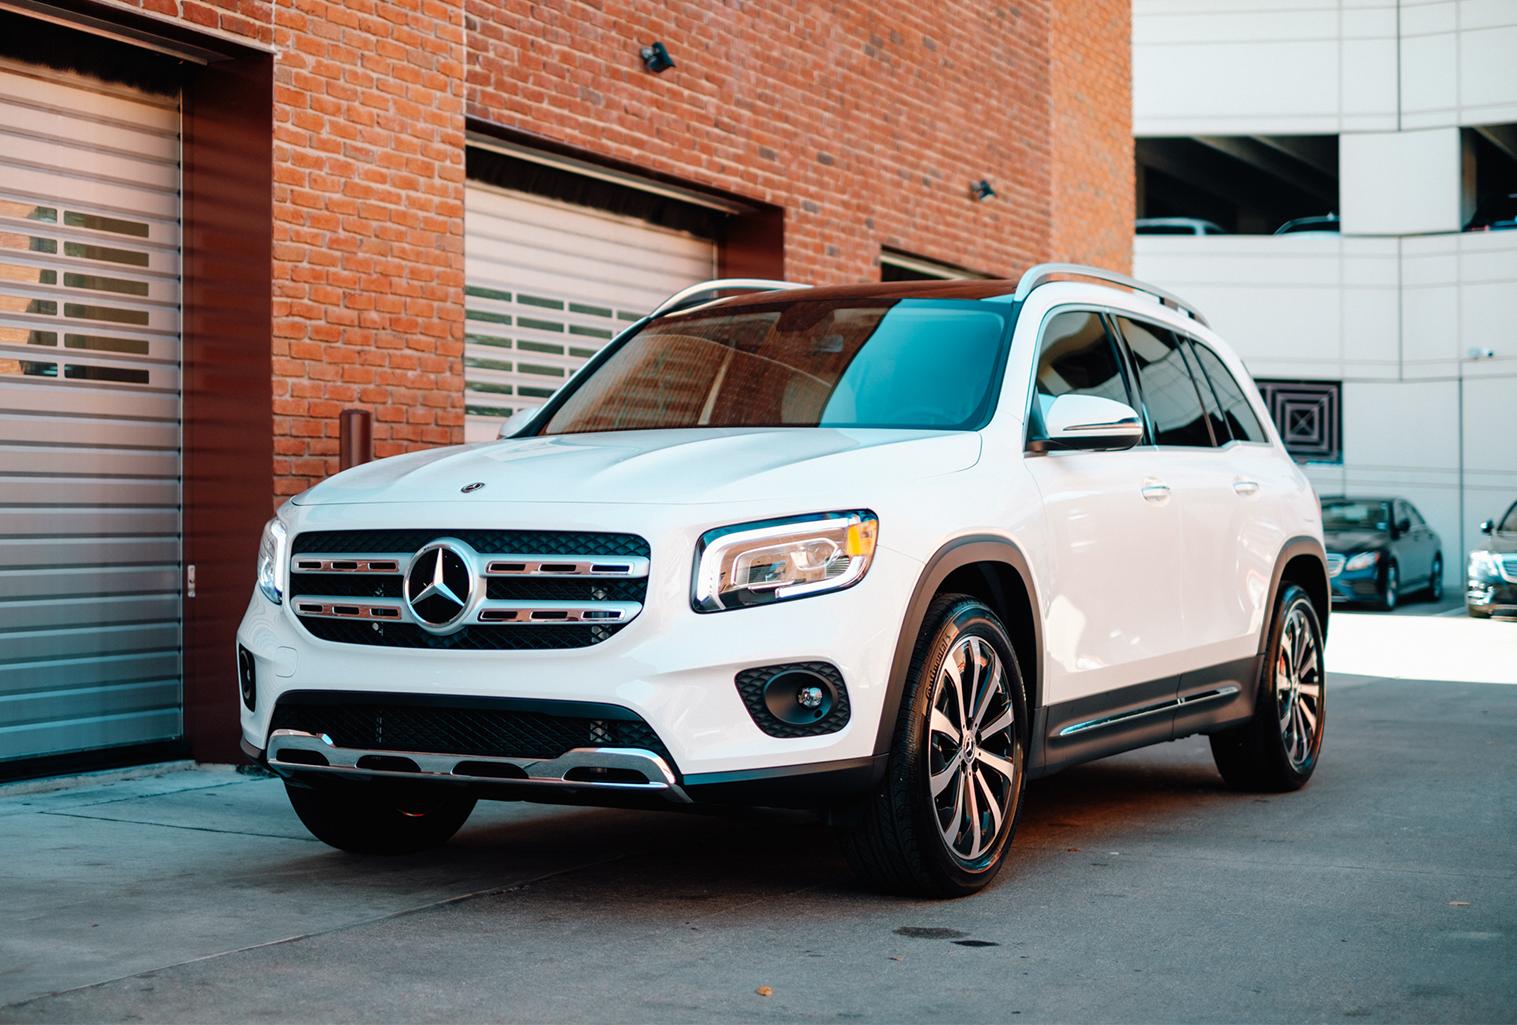 Mercedes-Benz Monthly Offers | Mercedes-Benz of Sugar Land